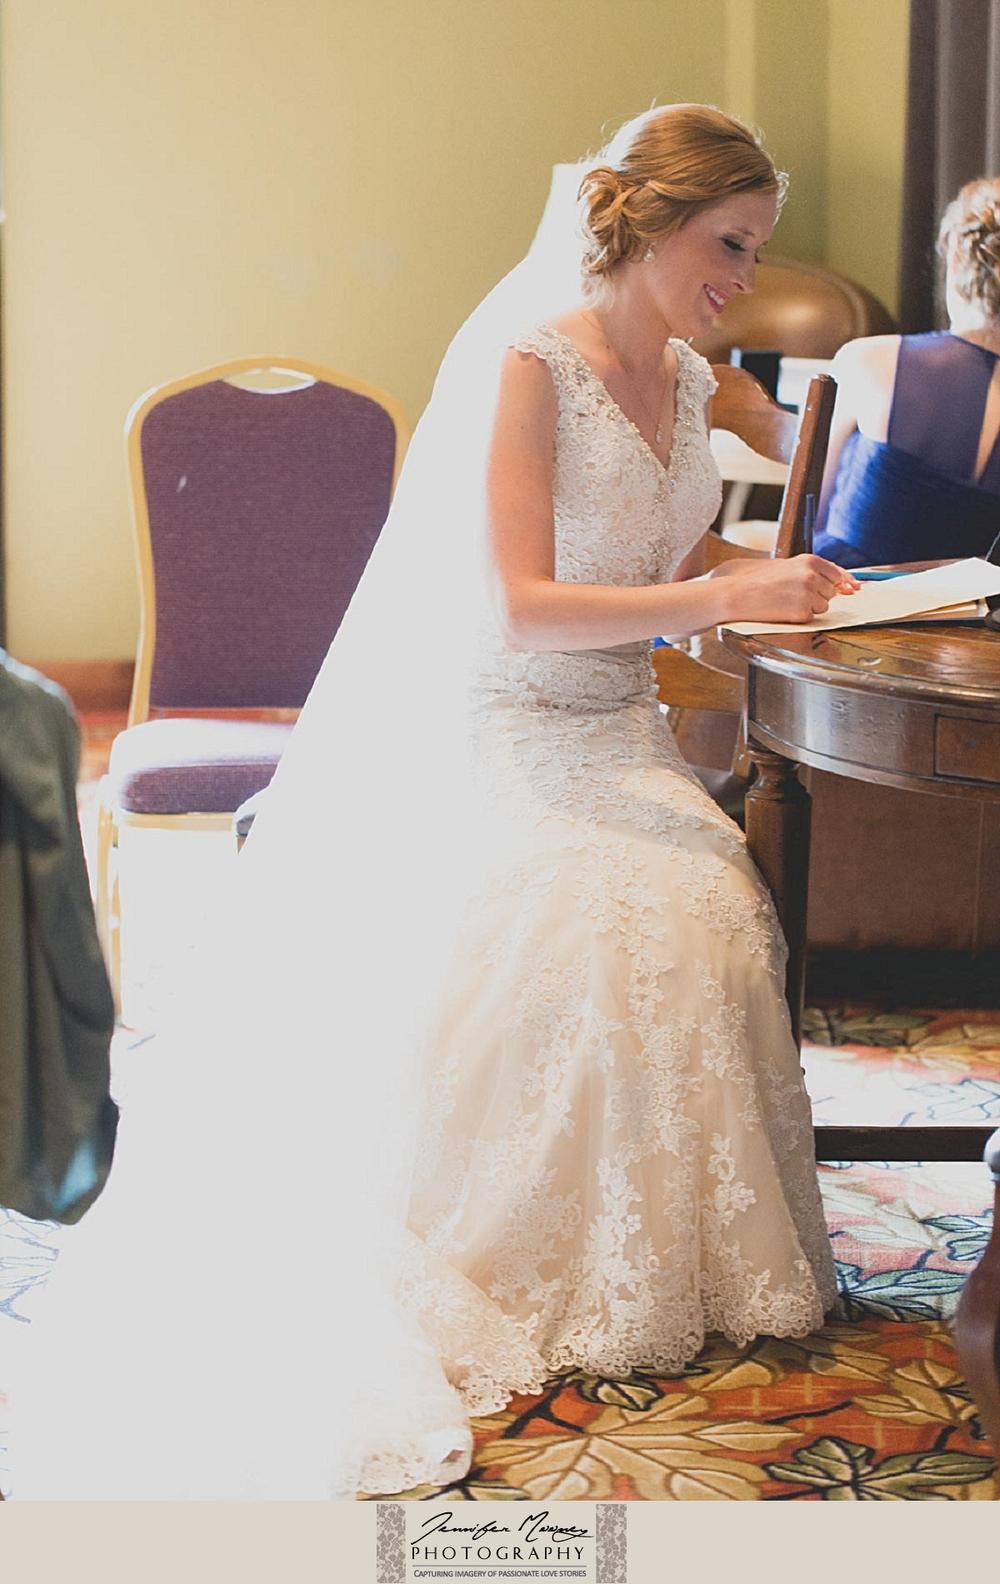 Jennifer_Mooney_Photo_ostler_Czahoroski_wedding_whitefish_lake_lodge_soulmates_love_montana_wedding_00147.jpg